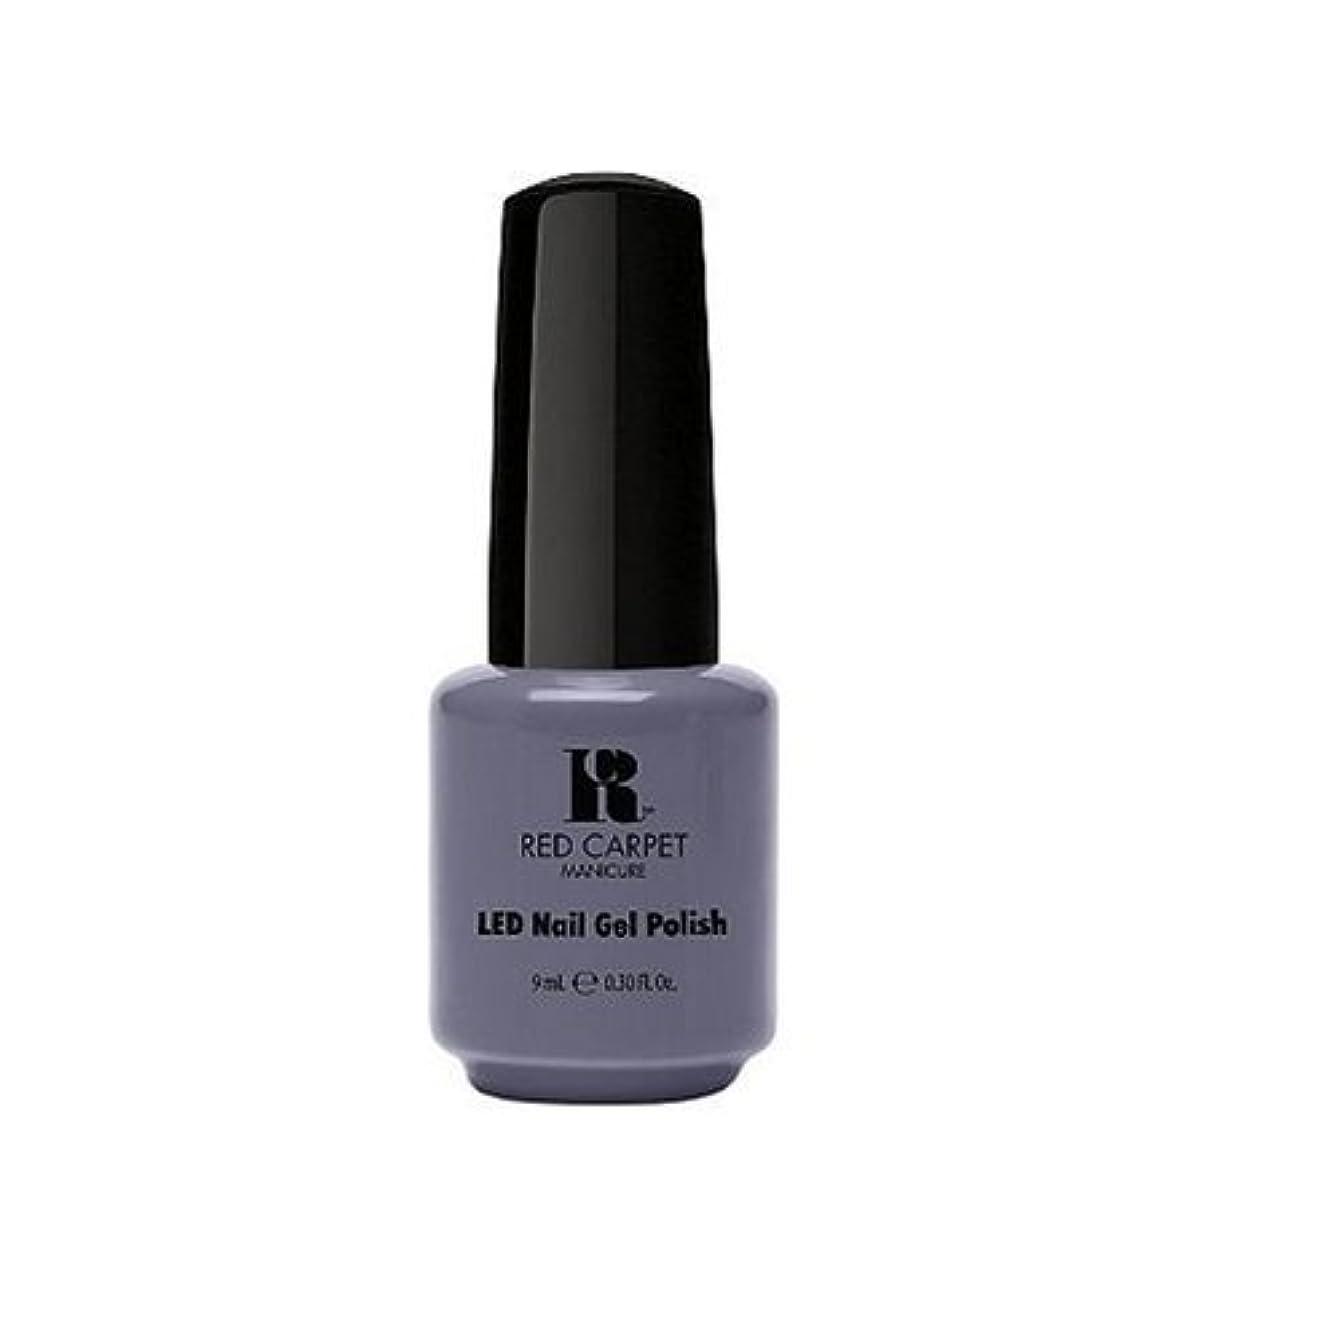 Red Carpet Manicure - LED Nail Gel Polish - Unscripted - 0.3oz / 9ml